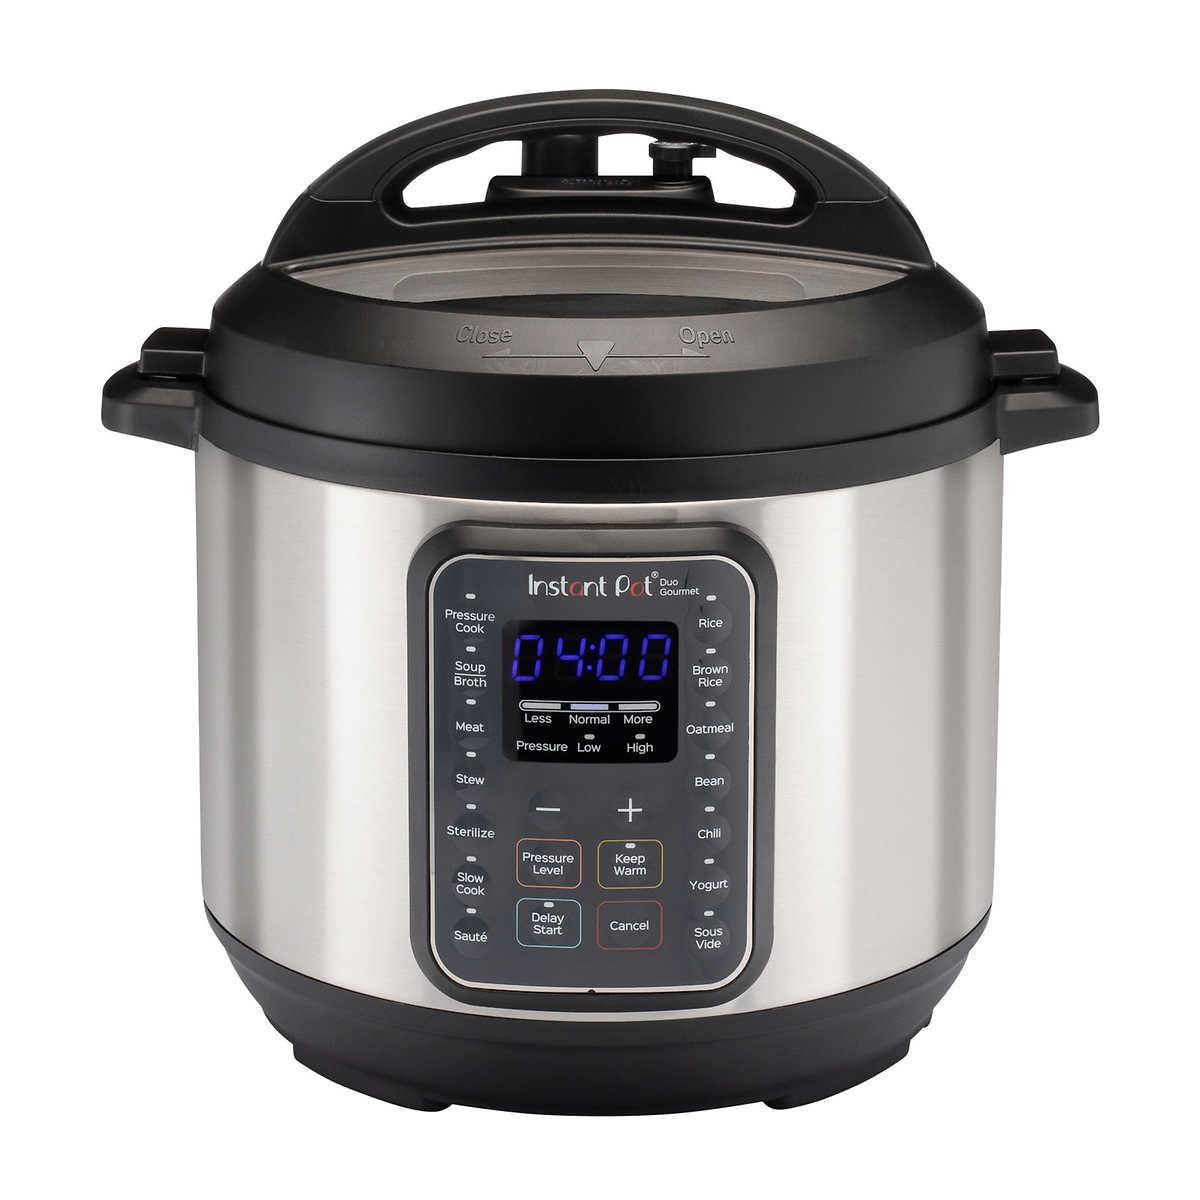 Instant Pot 6qt Duo Gourmet Multi Use Pressure Cooker